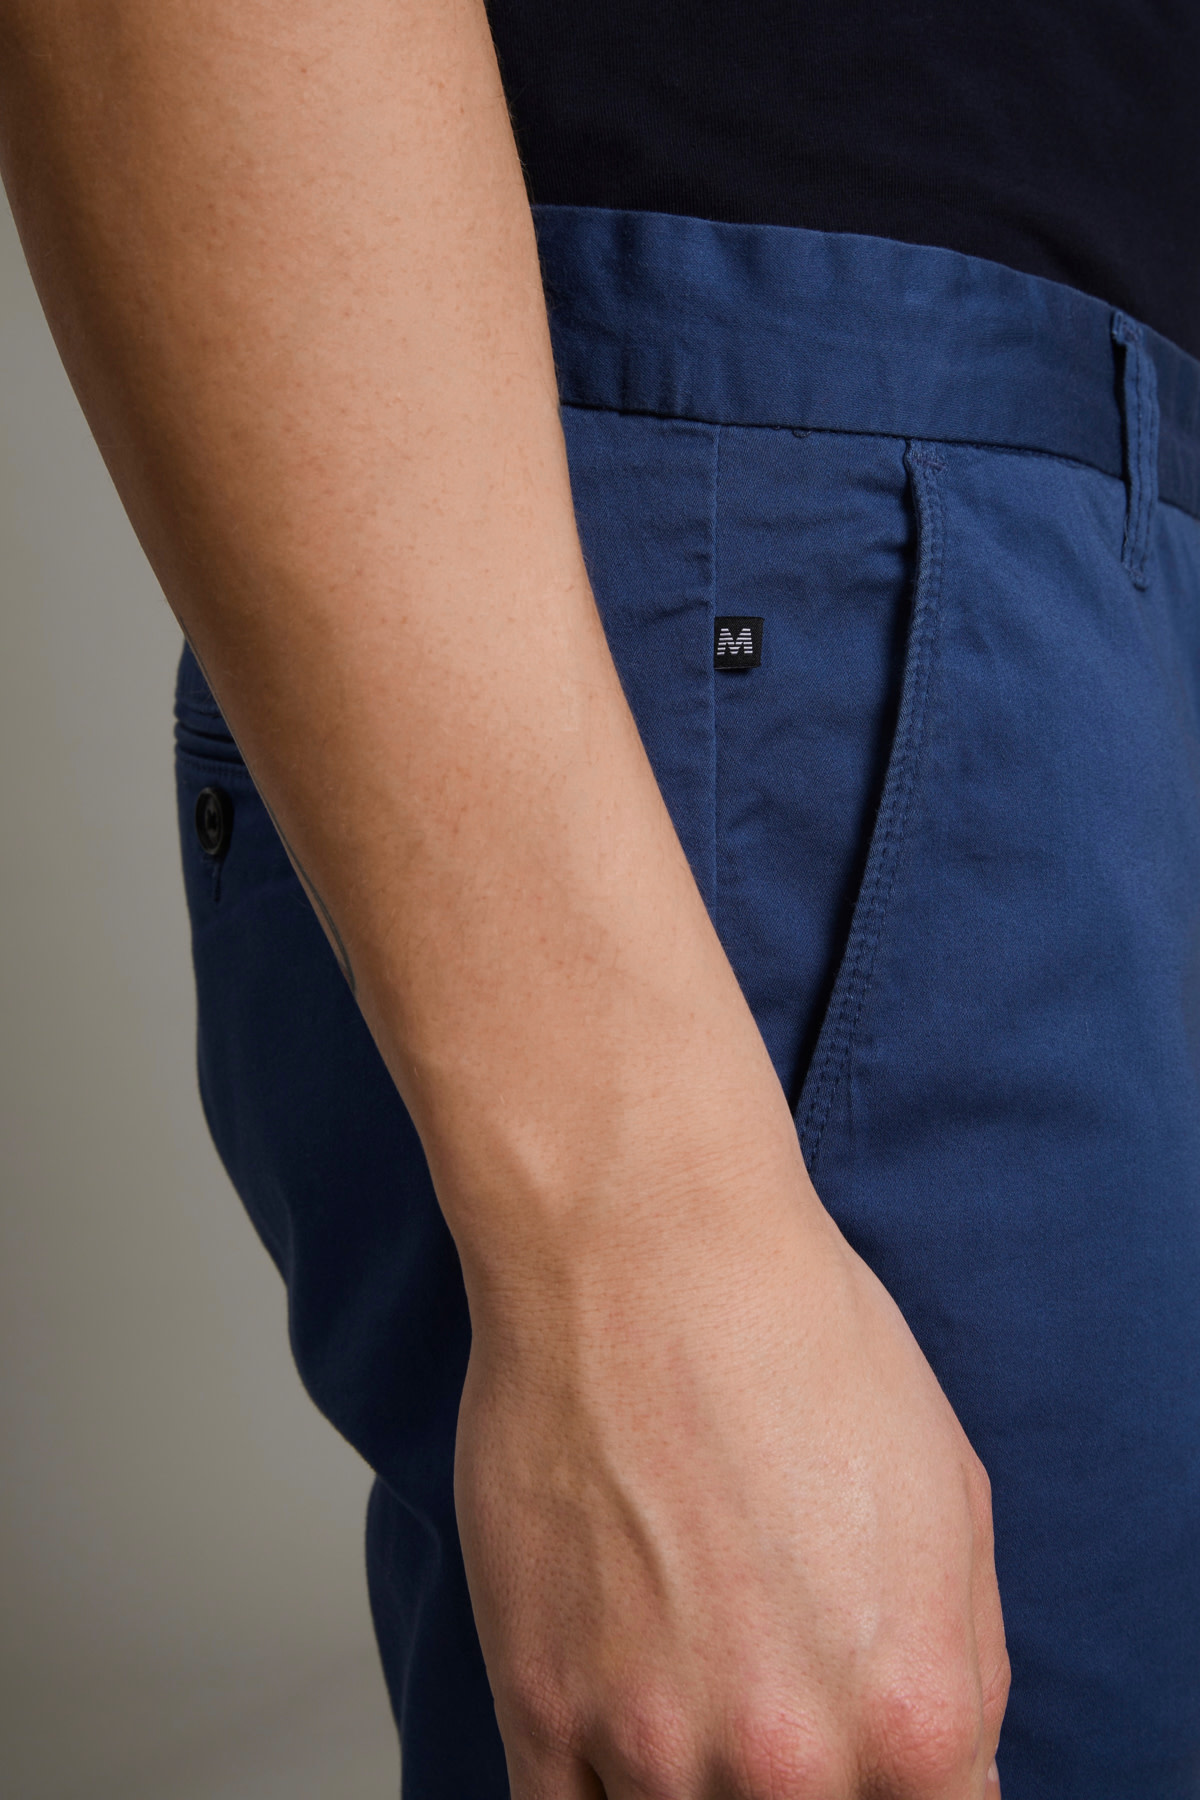 Pristu Chino Shorts - Dust Blue